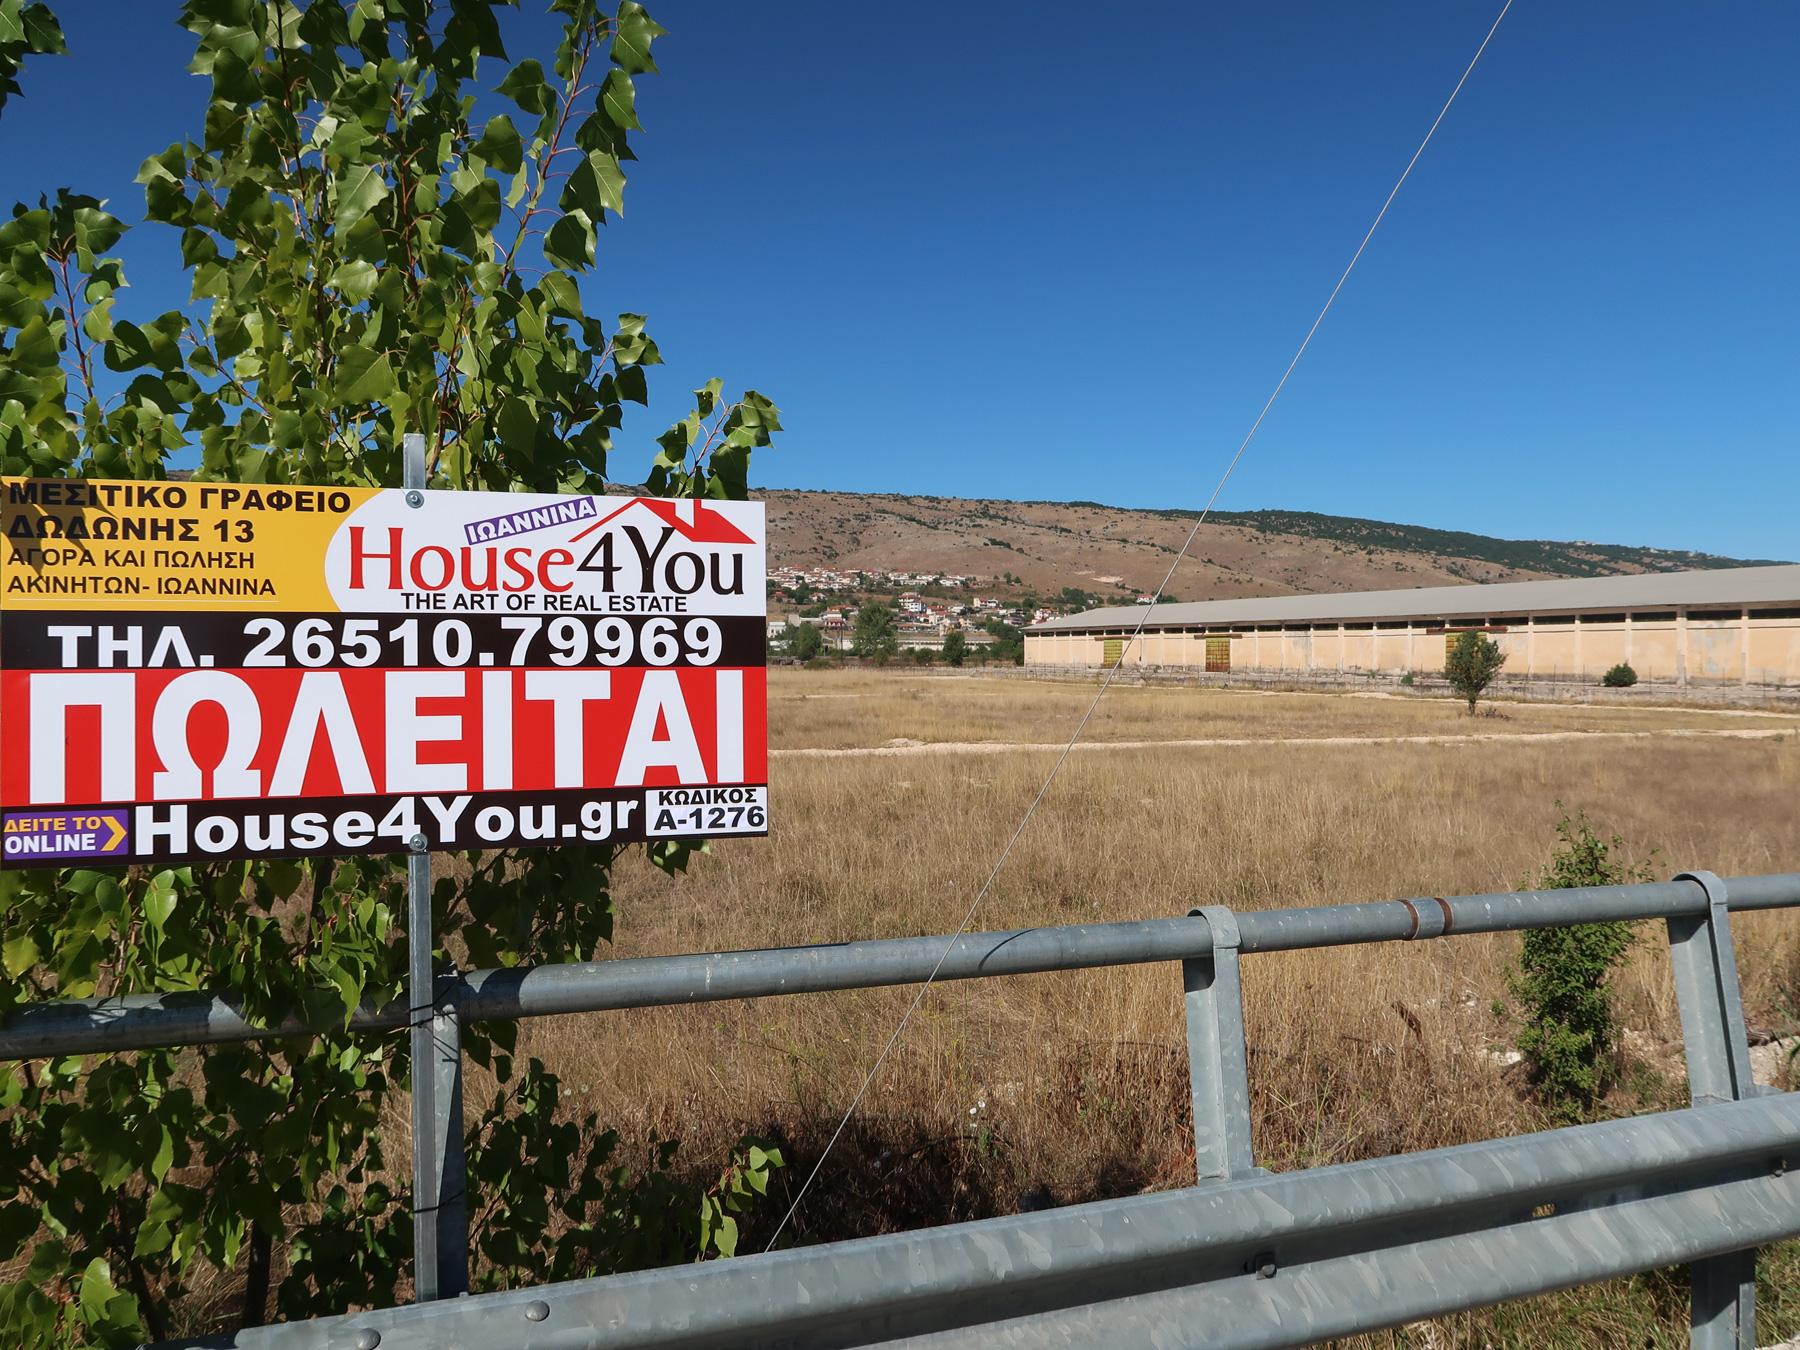 For sale a plot of 3,566 sq.m. in K. Neochoropoulo near Seismoplikton